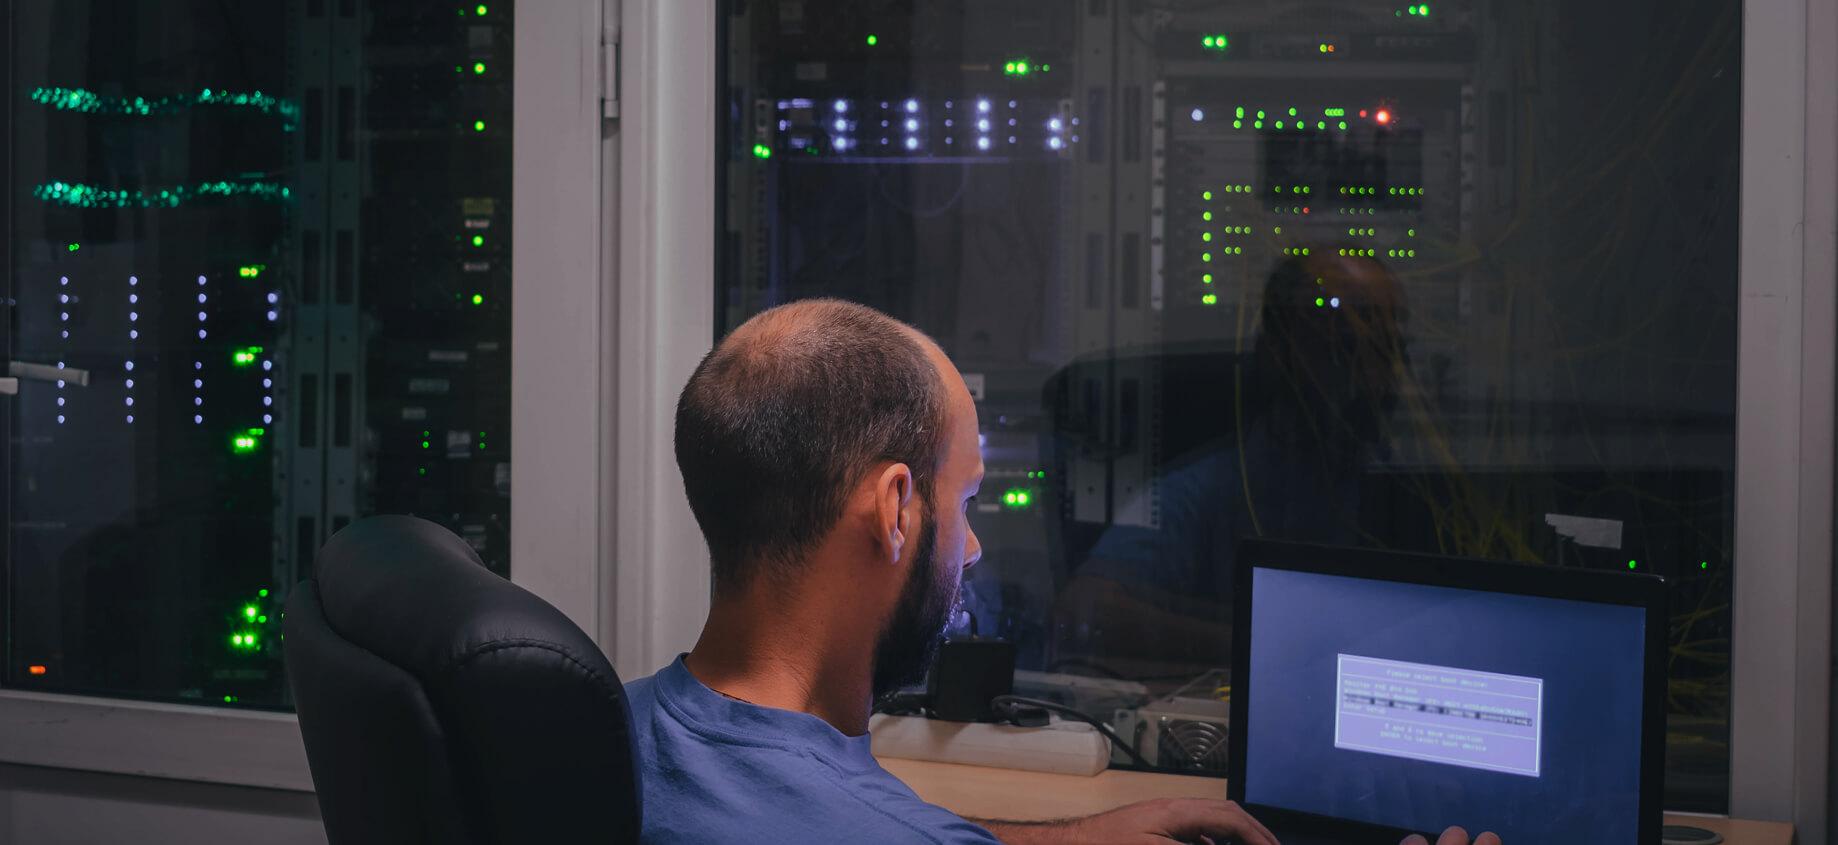 WDM Multiplexing Solutions